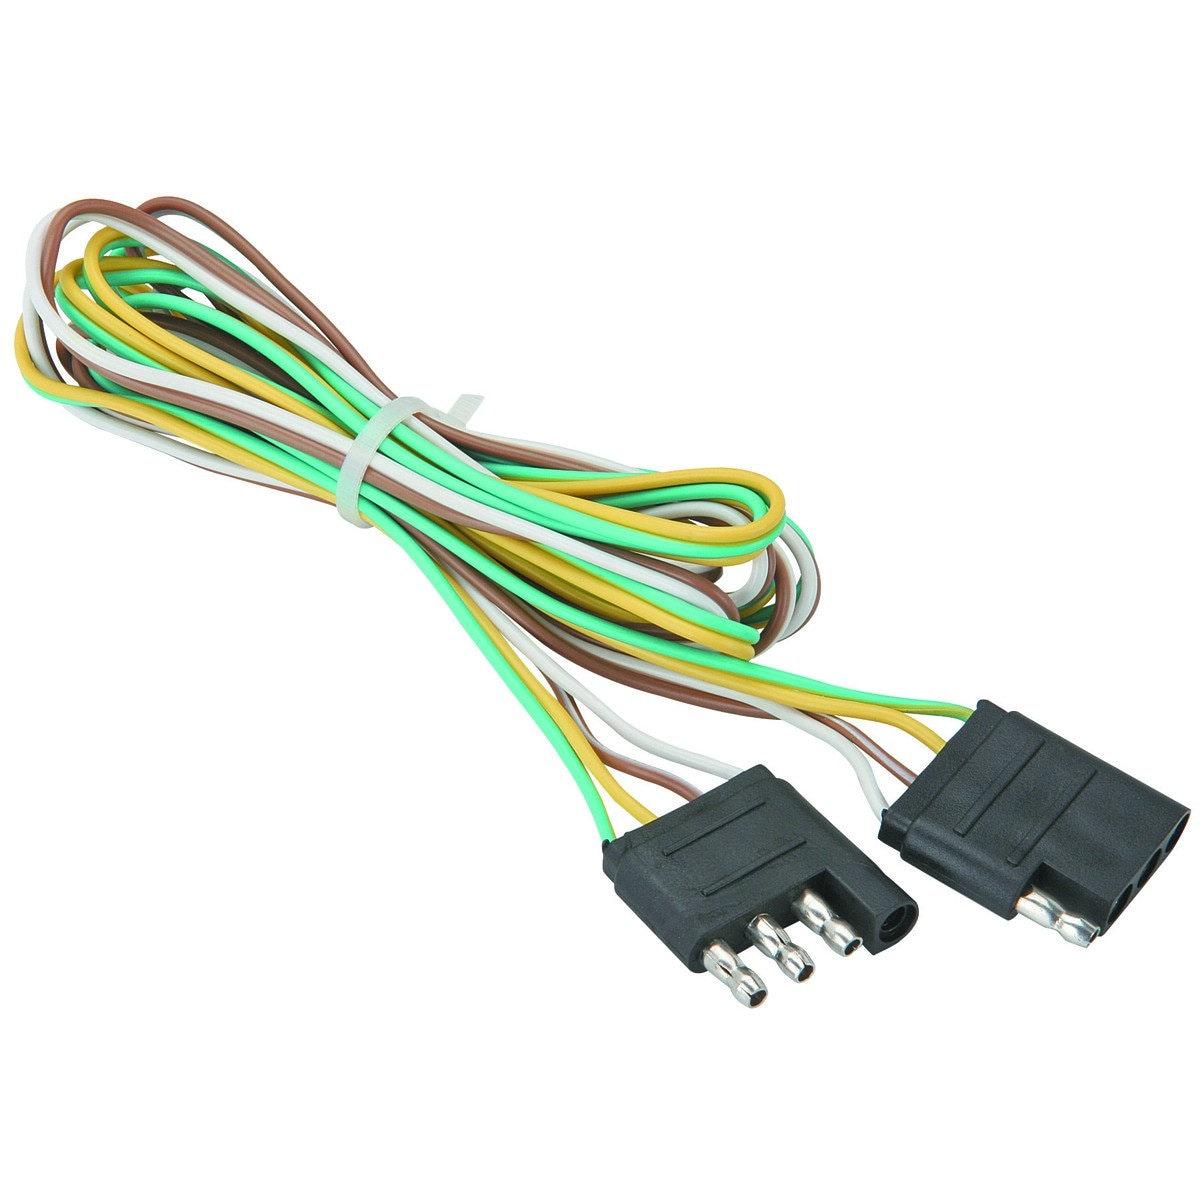 Trailer Wire Kit Haul Master 66616 12 Volt 22 Gauge Wires Etsy Wiring Color Image 0